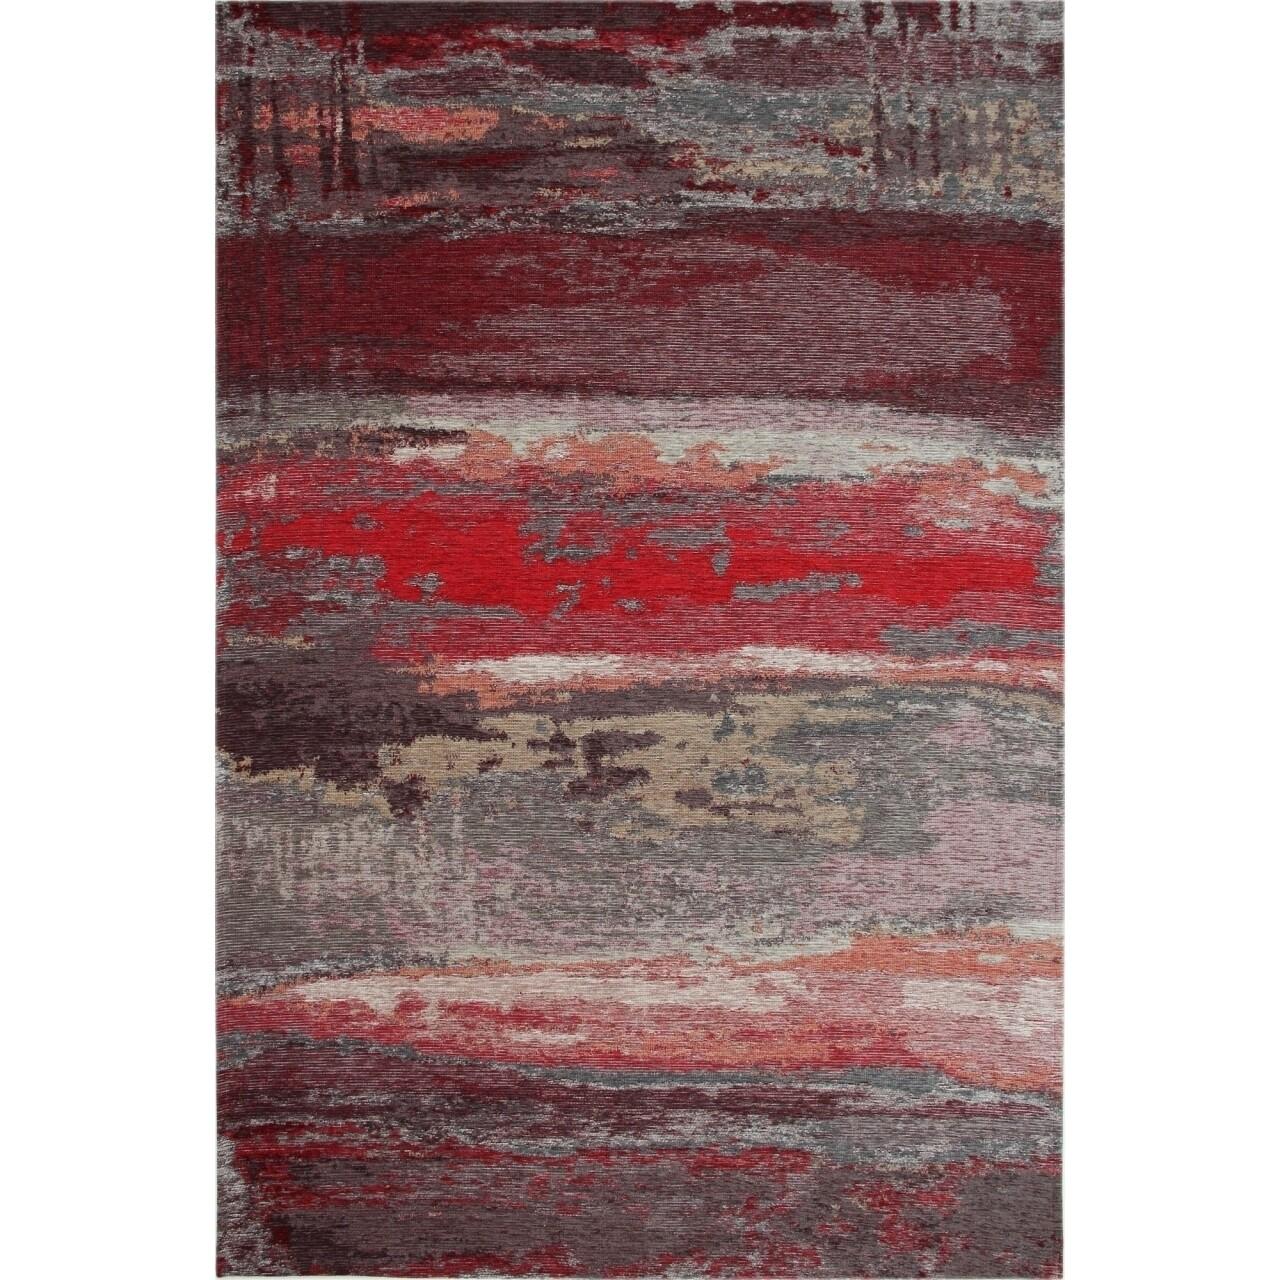 Covor rezistent Eko, SM 12 - Grey, Red XW, 100% acril,  80 x 300 cm